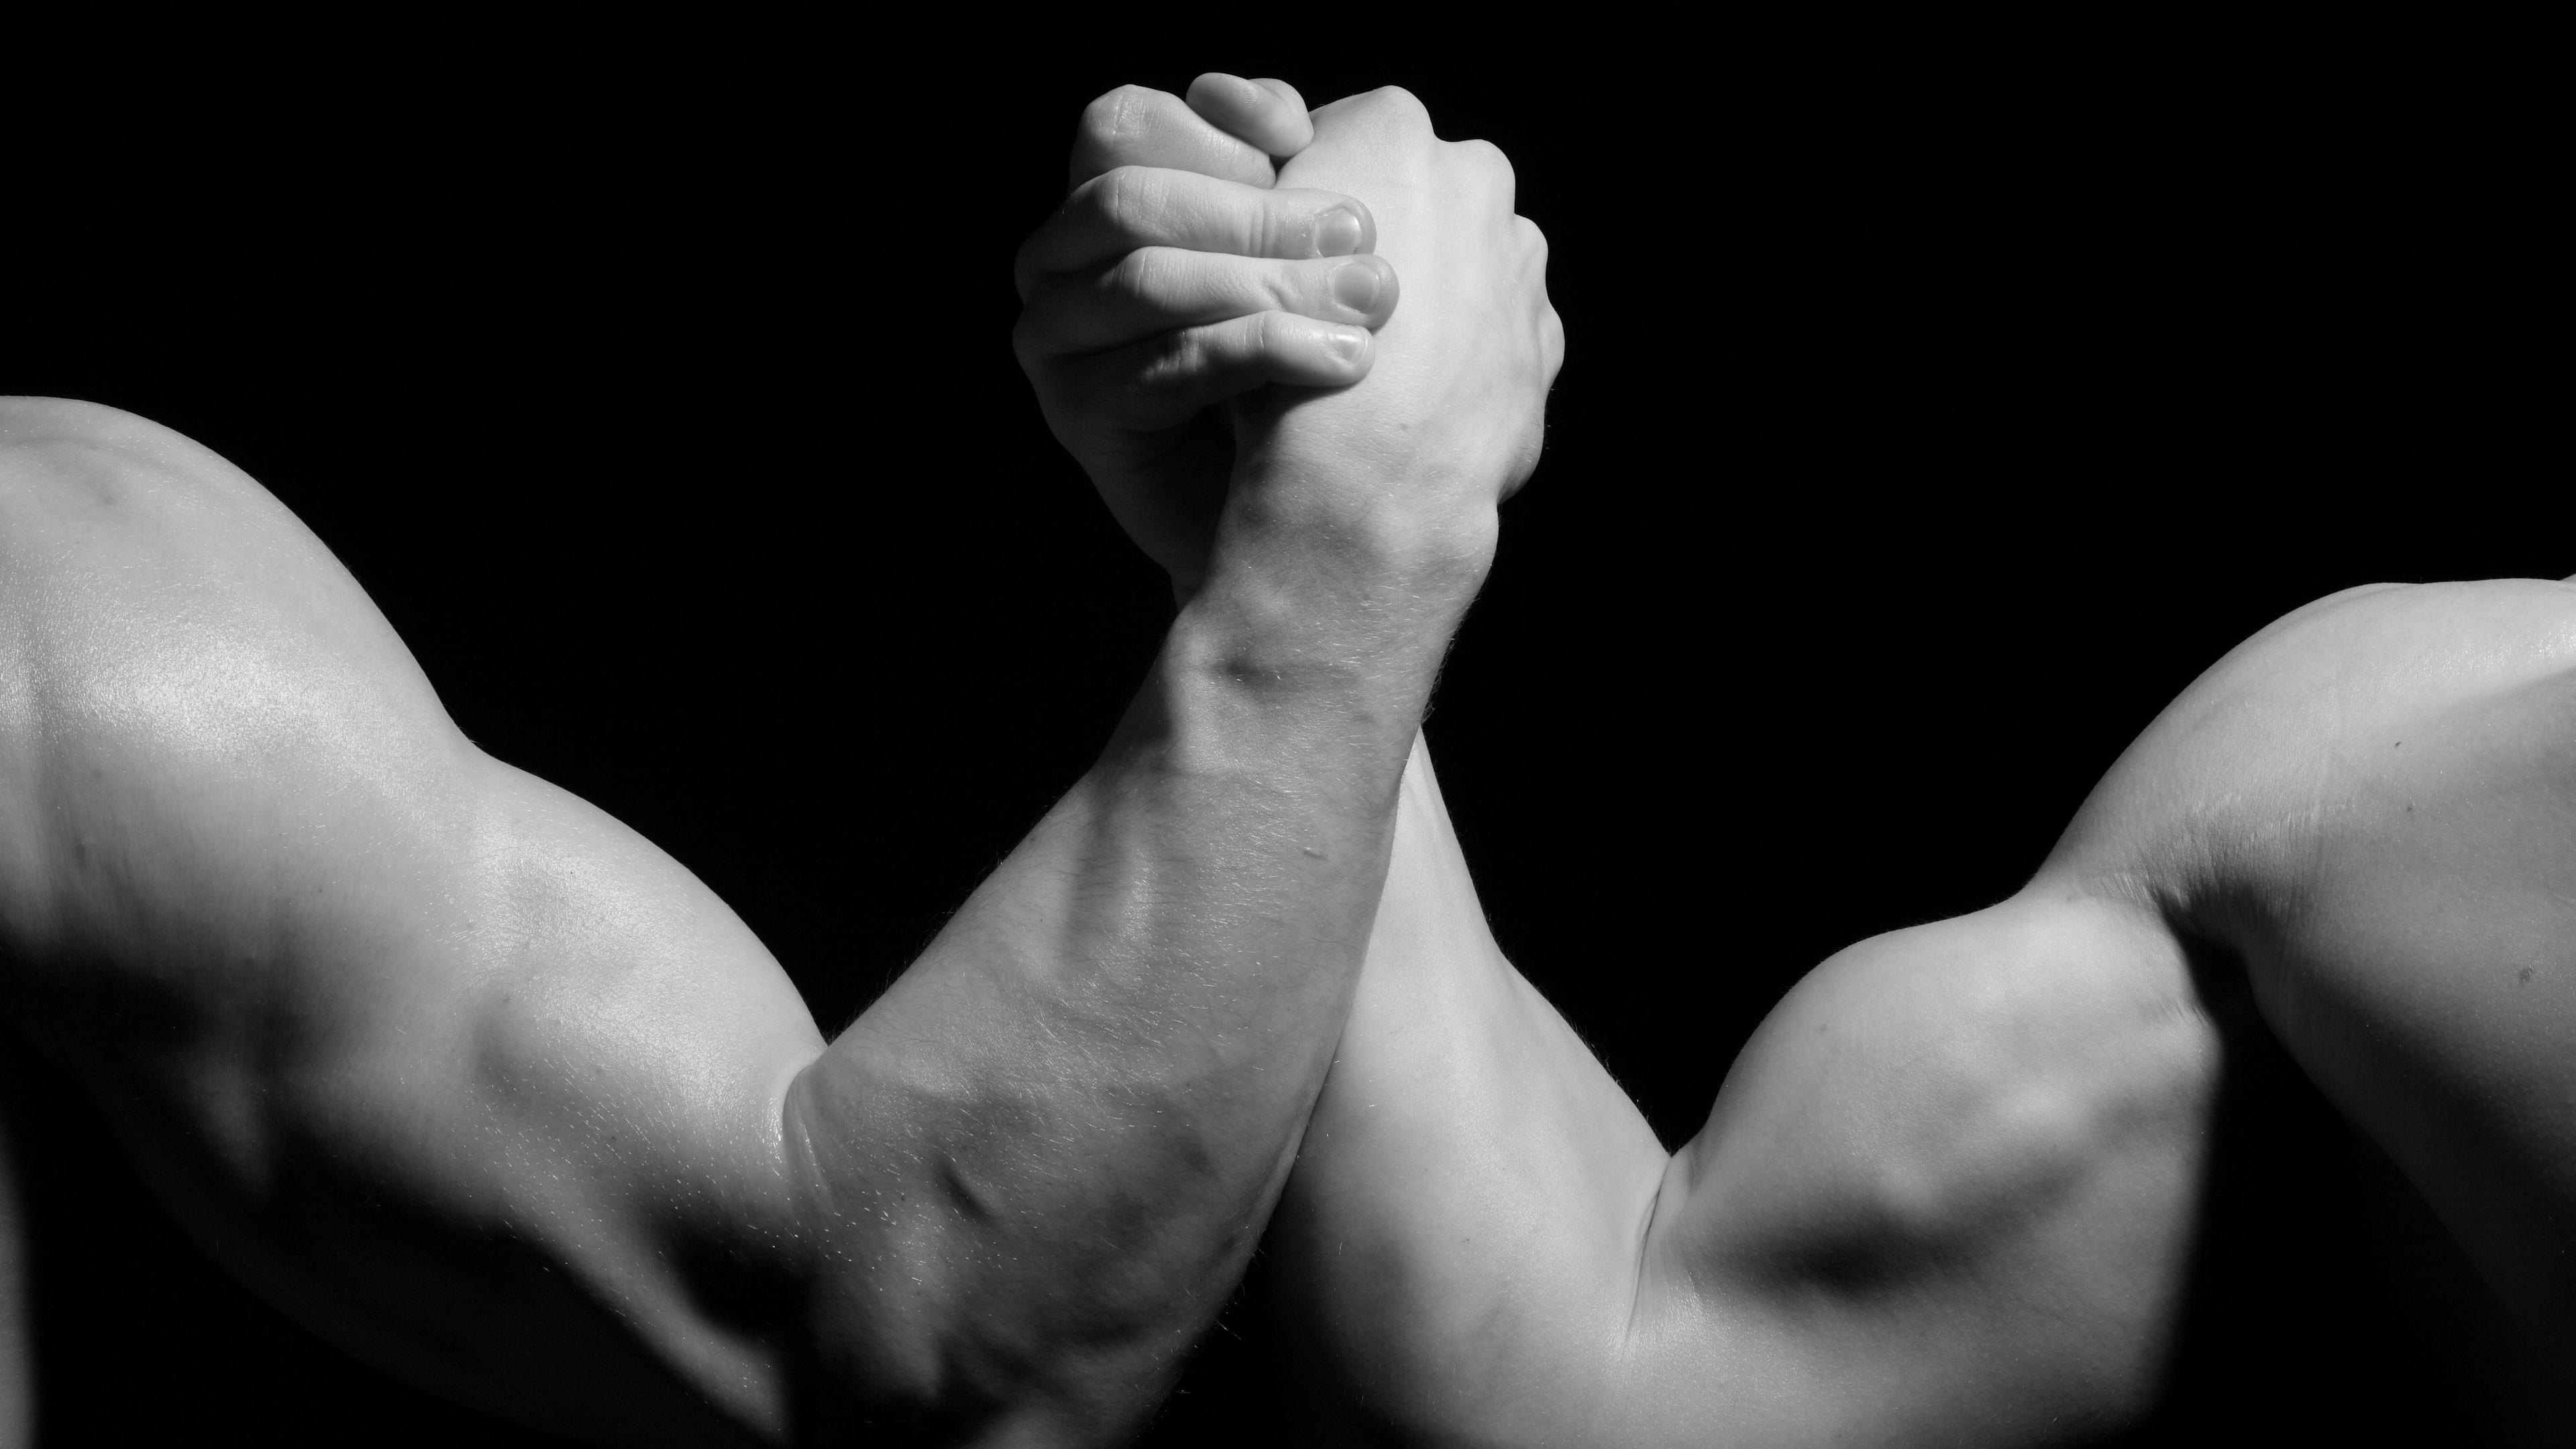 hands men wrestling biceps black and white arm wrestling 4k 1540063186 - hands, men, wrestling, biceps, black and white, arm wrestling 4k - wrestling, Men, Hands